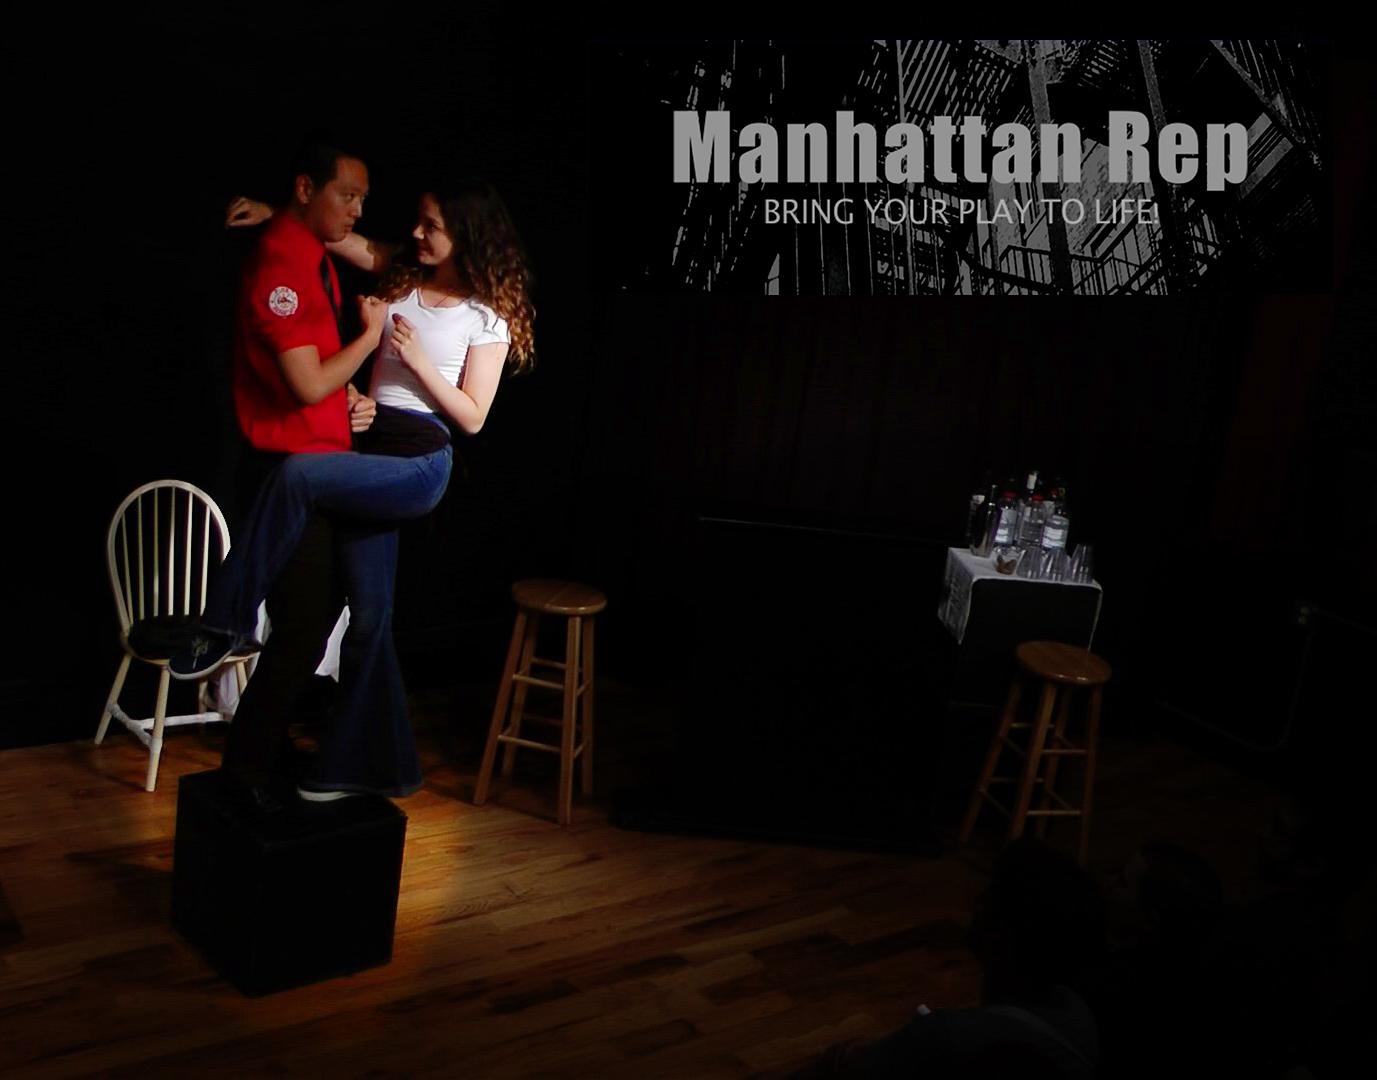 Manhattan Rep